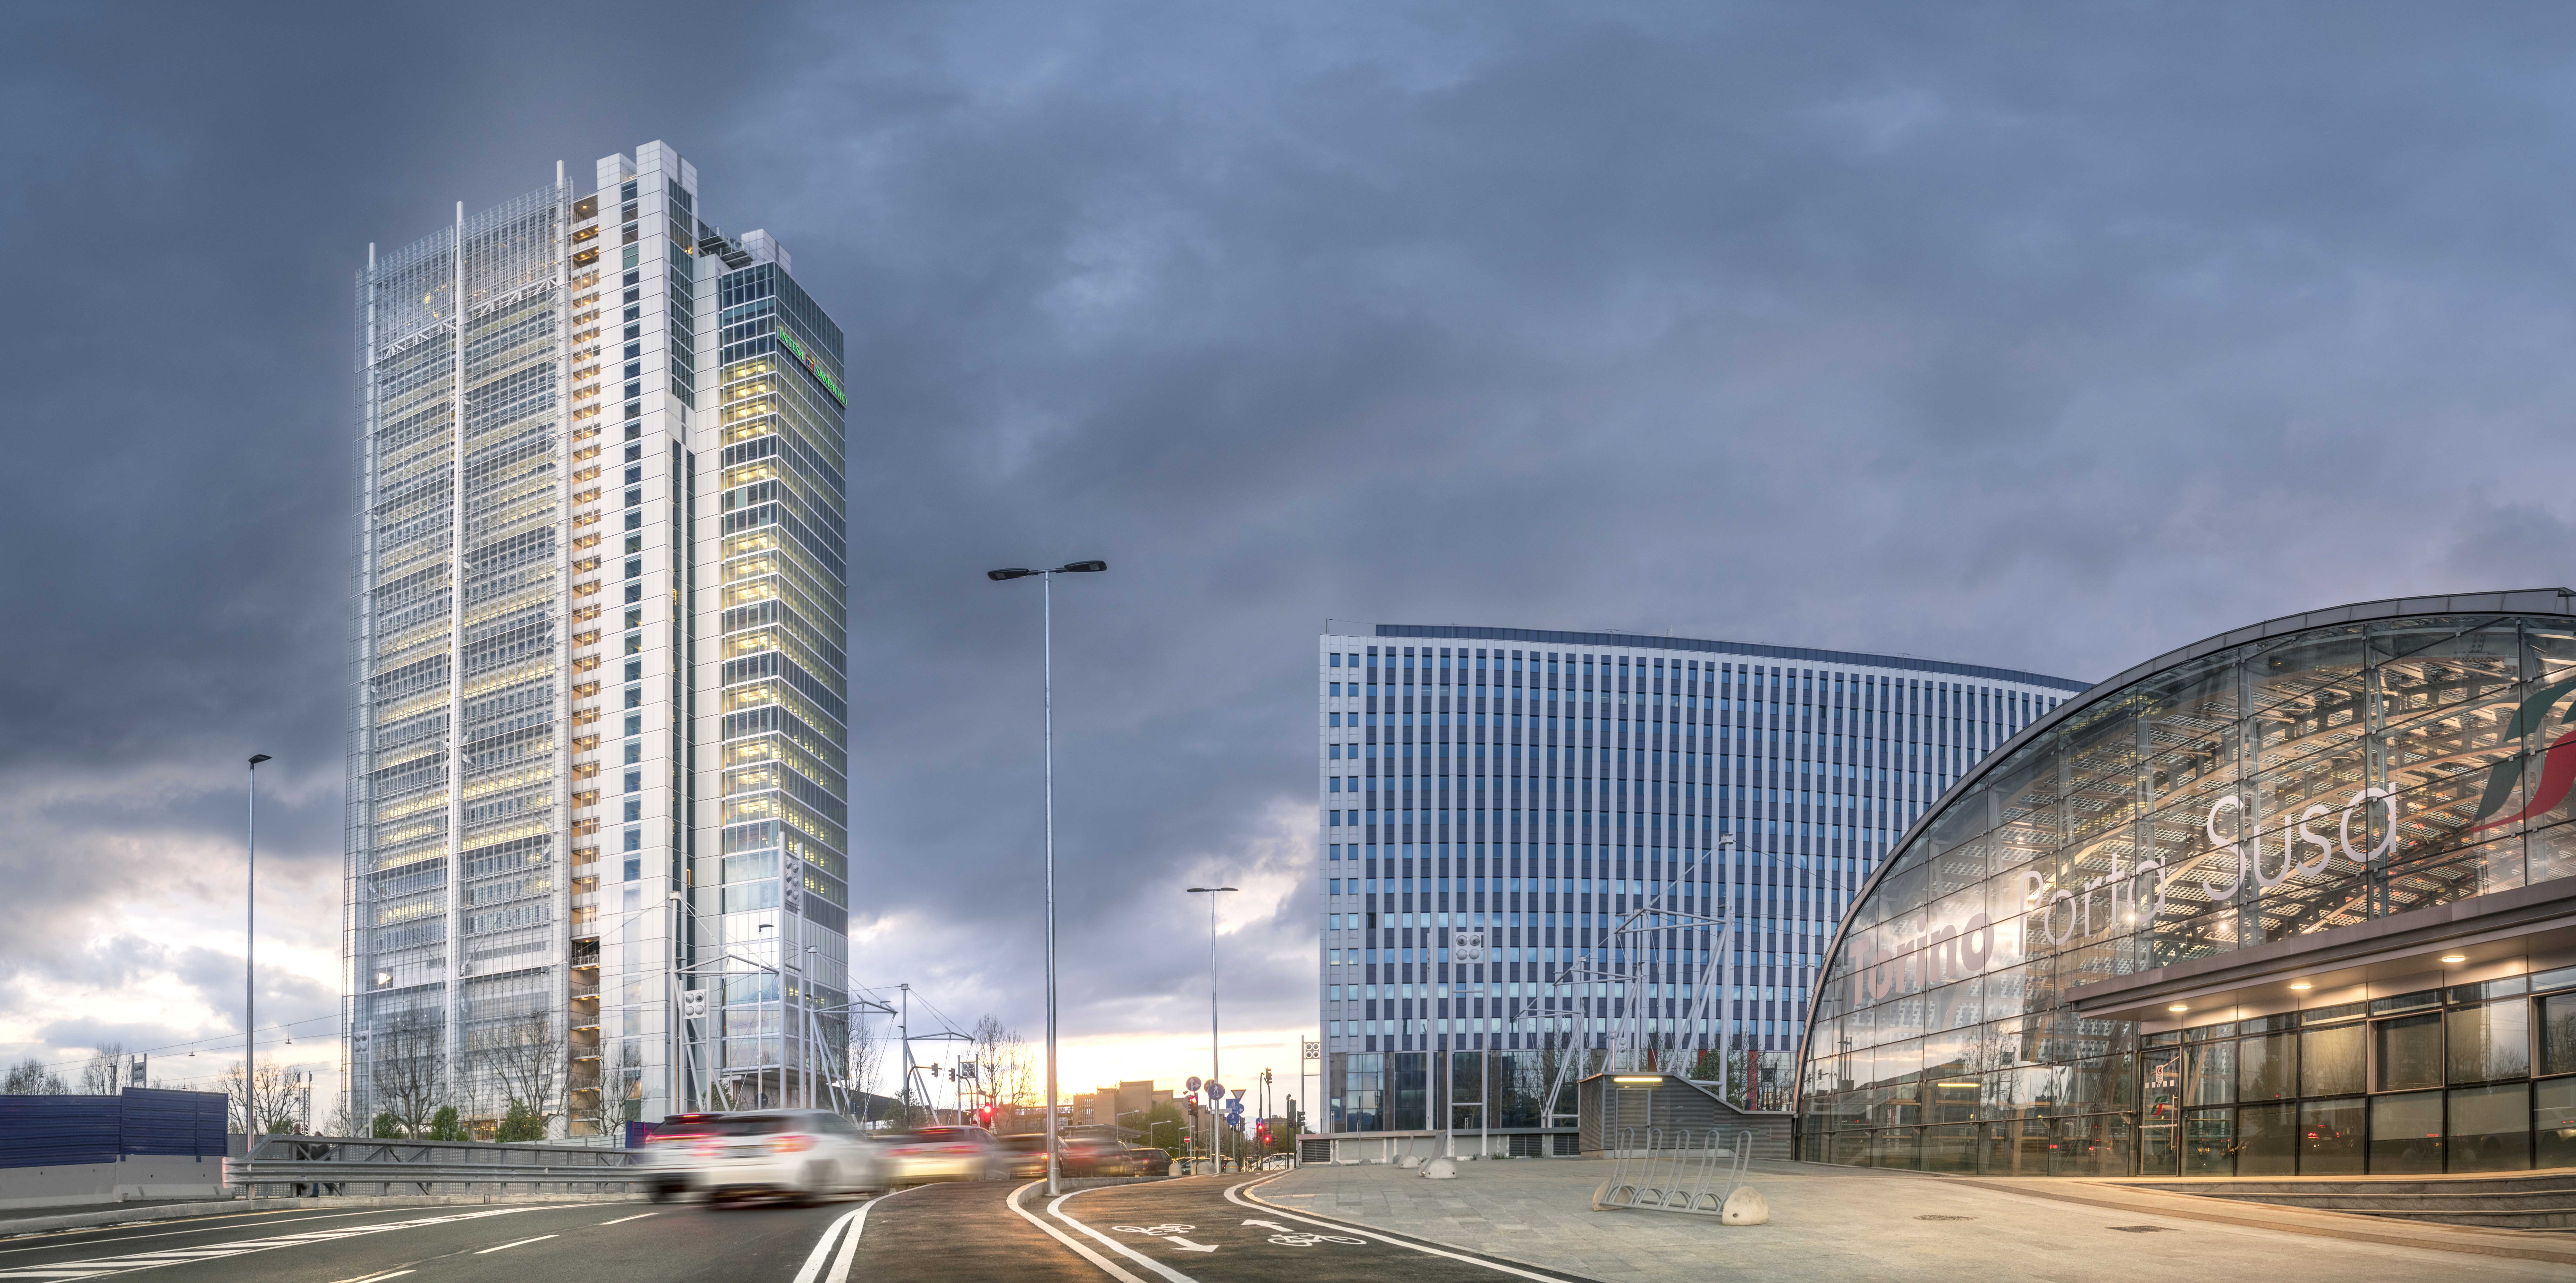 Grattacielo Intesa SanPaolo / Renzo Piano Building Workshop